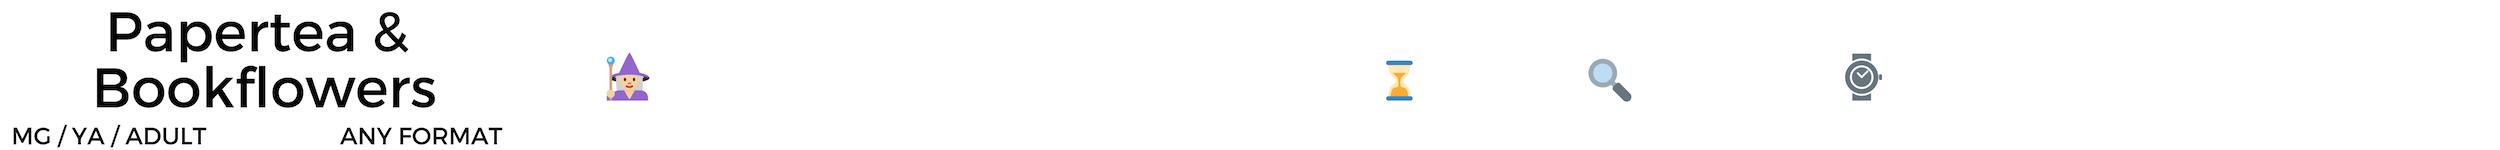 BOOK BLOG COMMUNITY _ BANNER + PROFILES [2500 x 150] (12).jpg